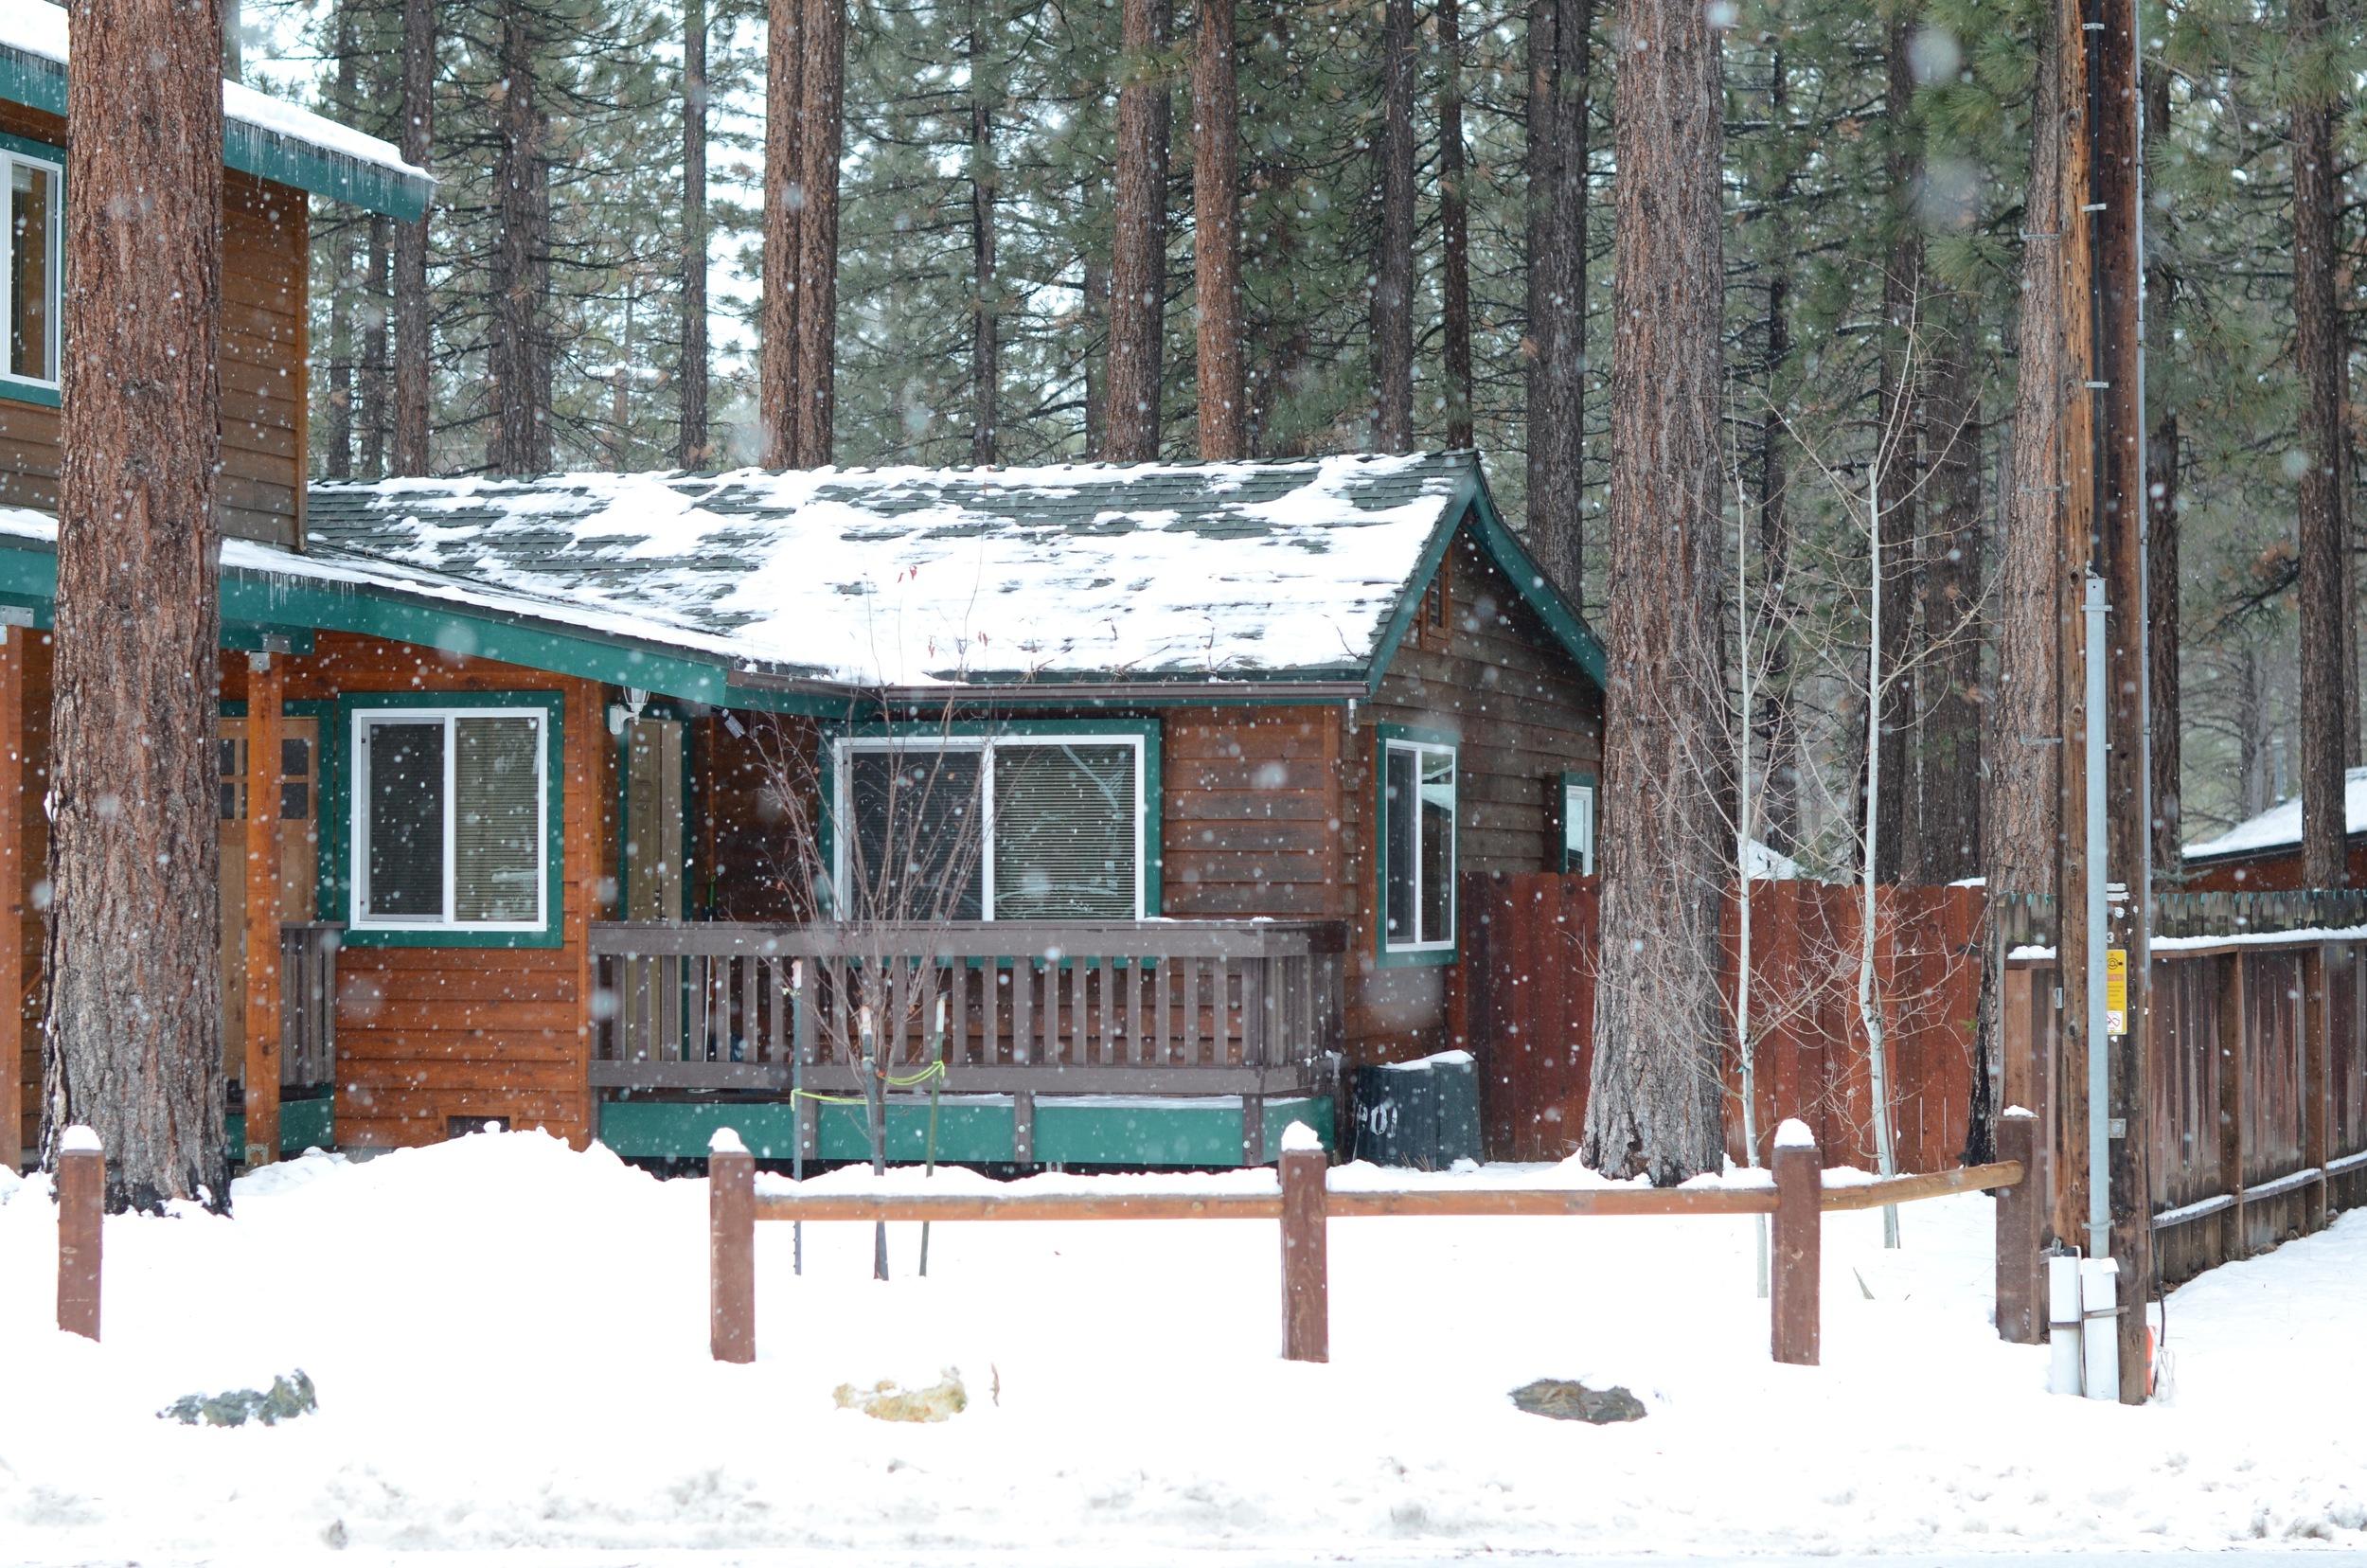 Rustic cabins everywhere.